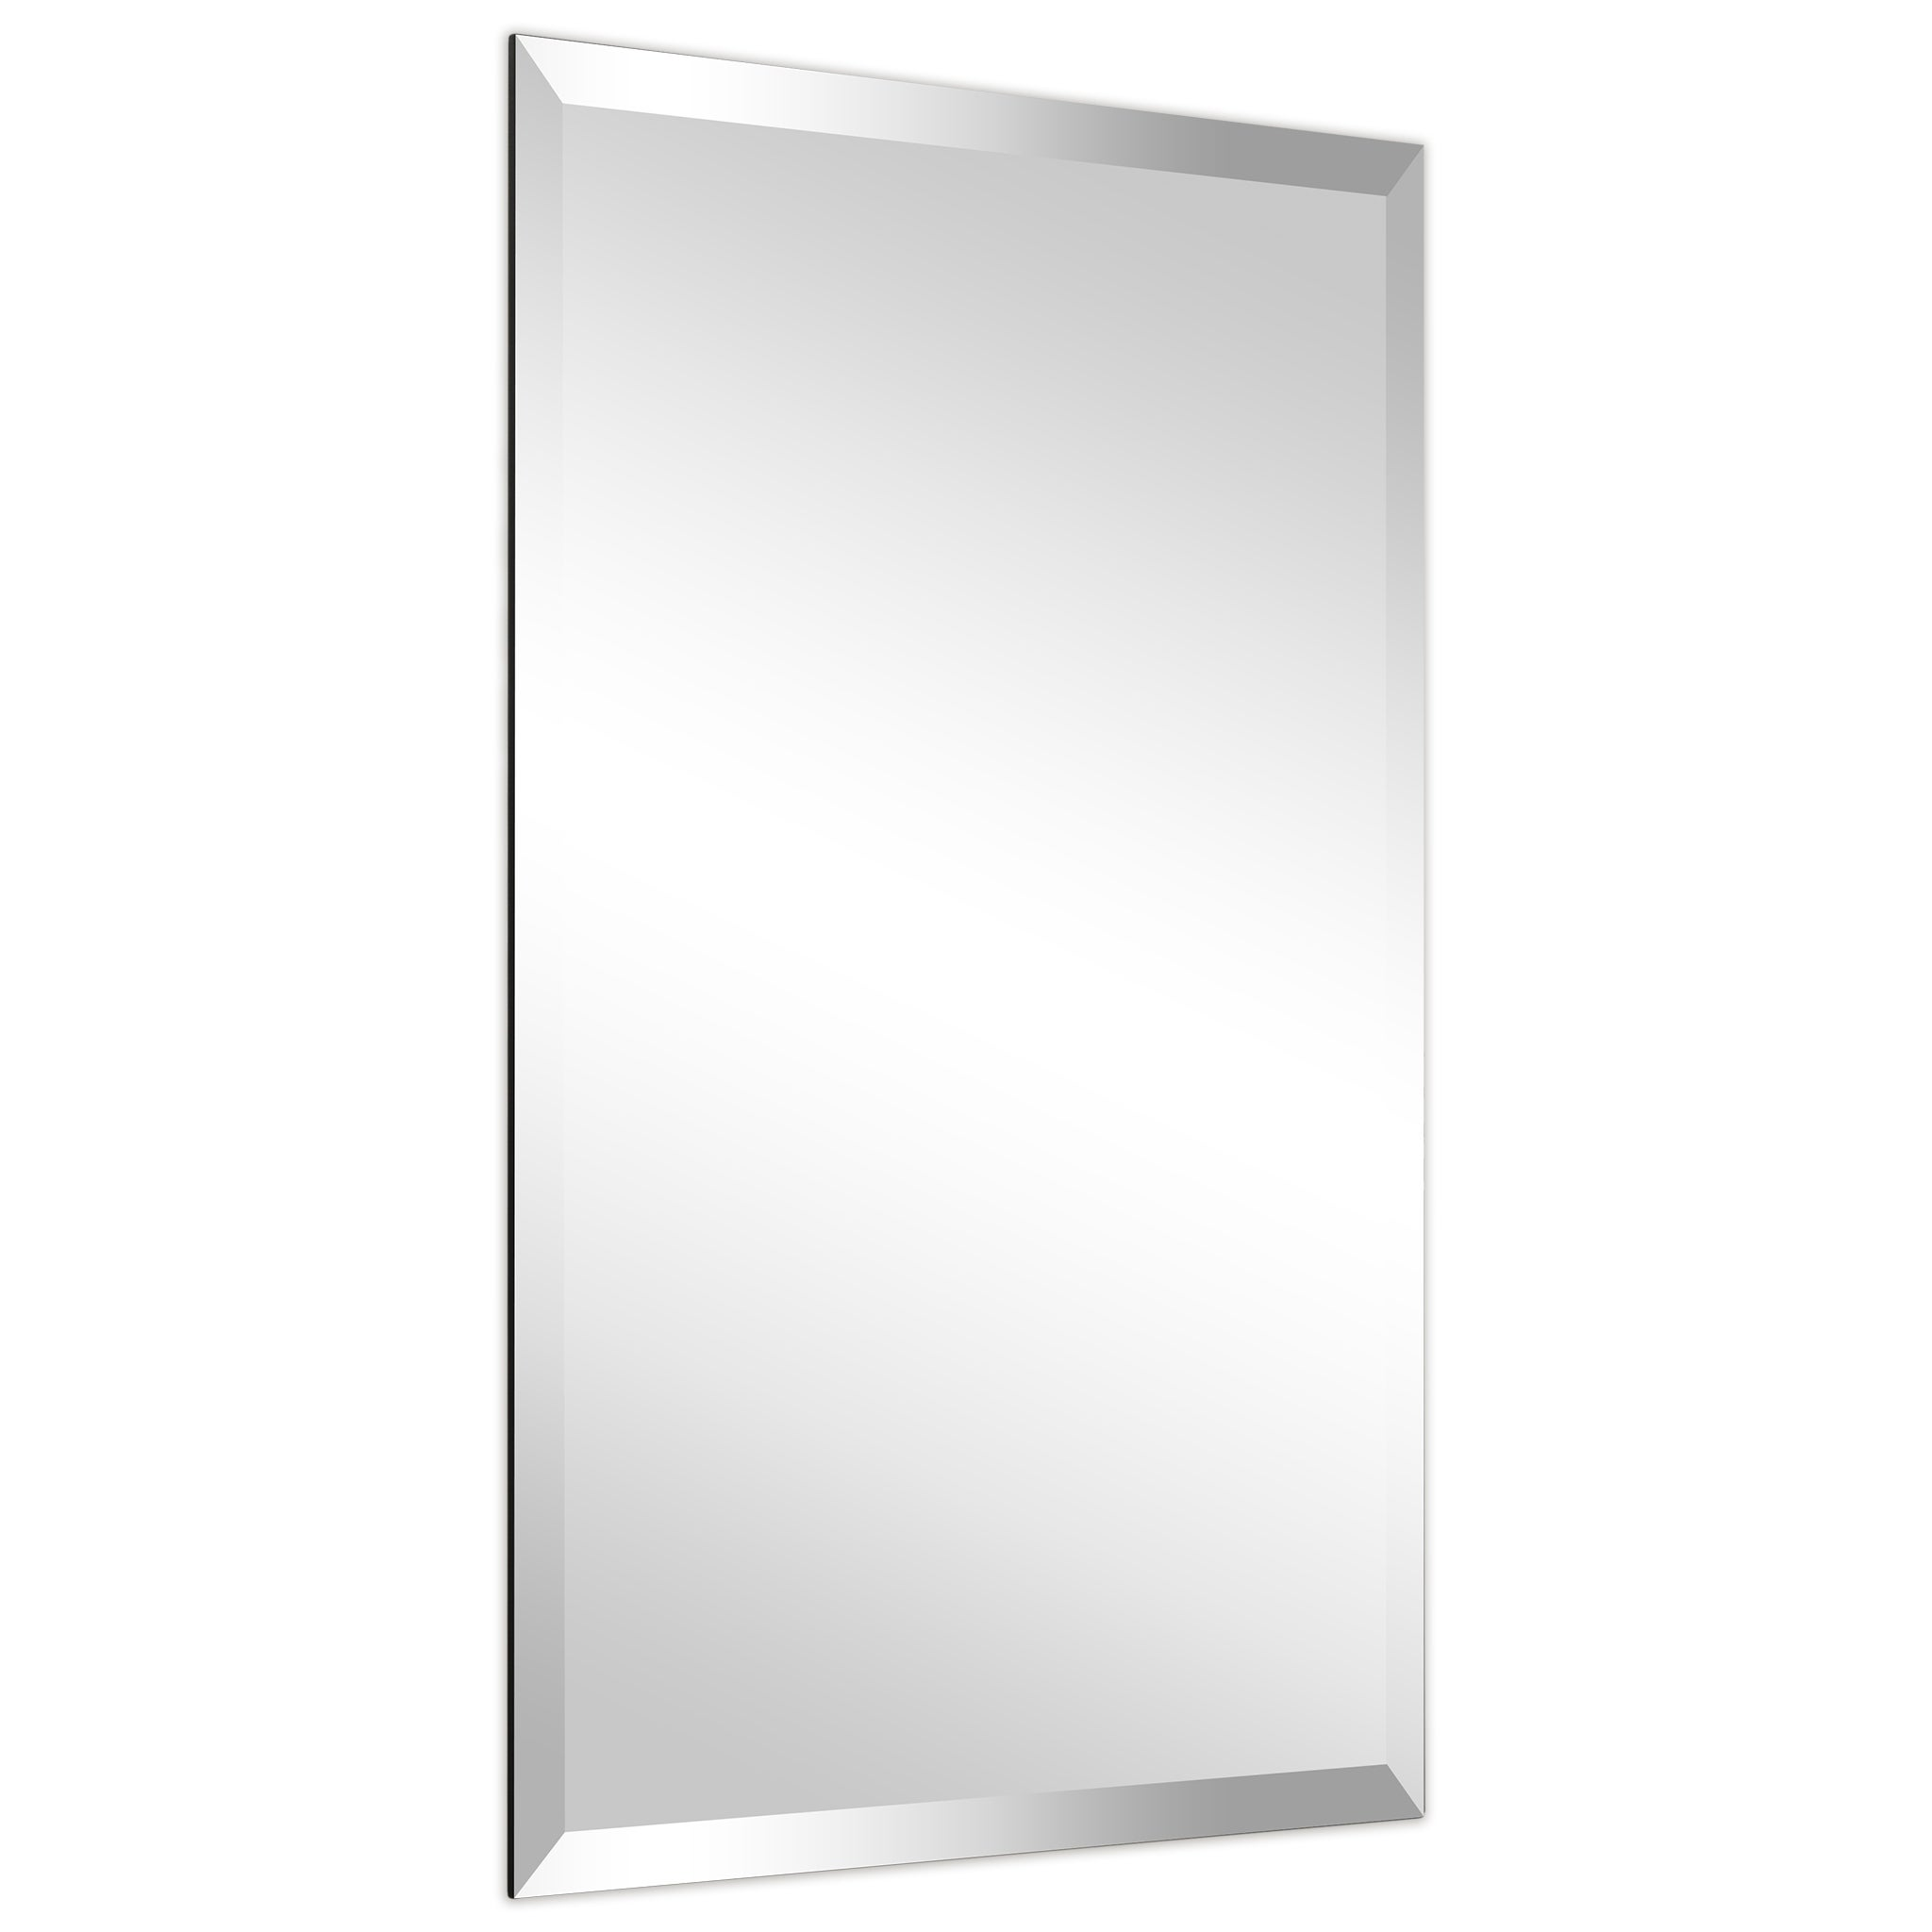 Shop Black Friday Deals On Frameless Beveled Prism Wall Mirror Bathroom Vanity Bedroom Mirror 1 Beveled Edge Clear Overstock 24220389